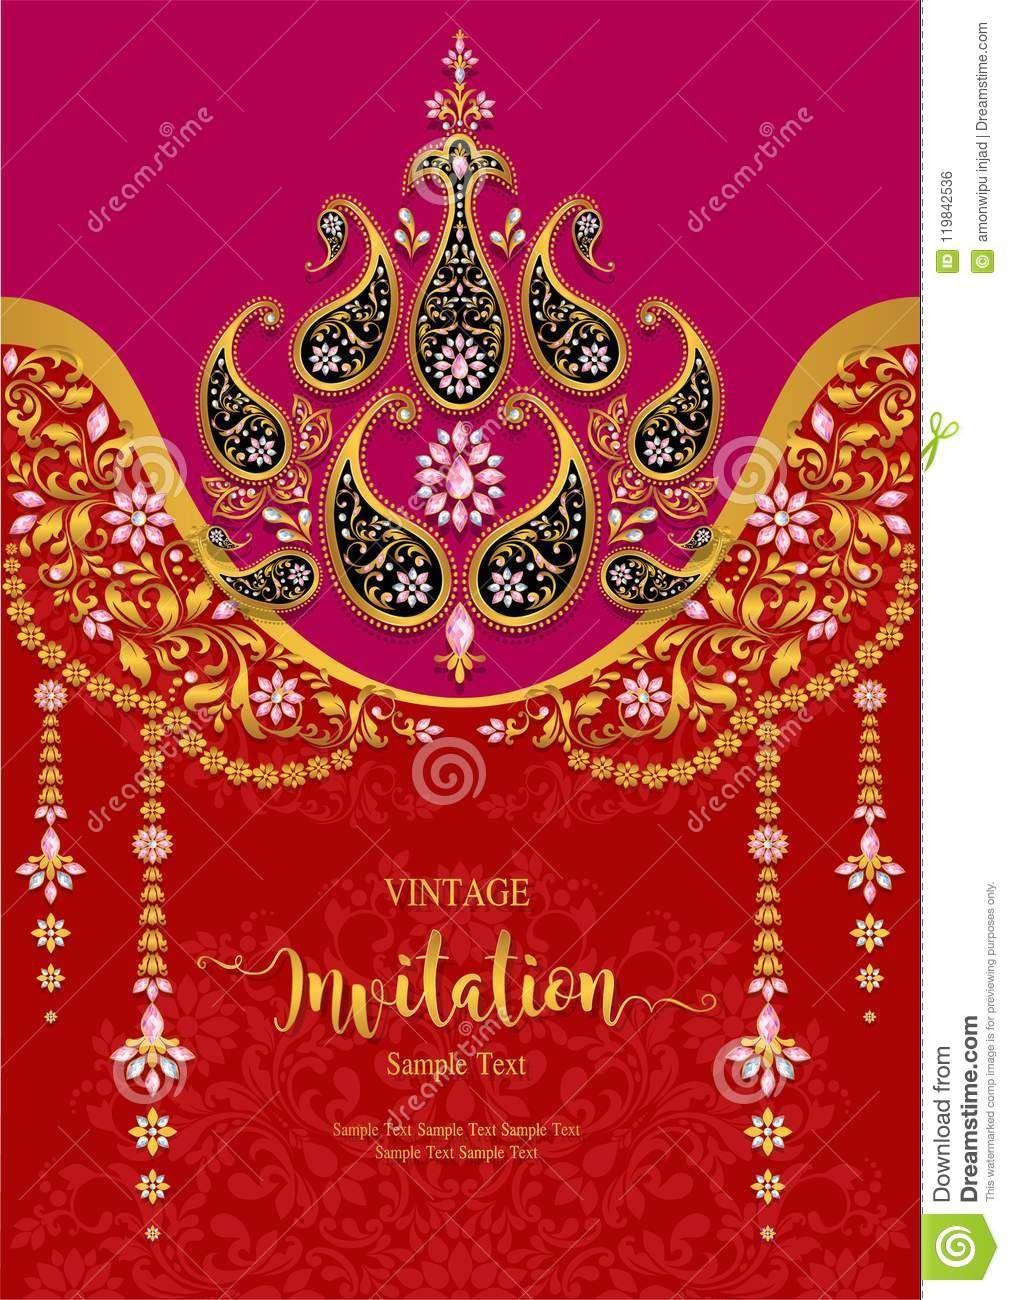 Wedding Invitation Card Templates Stock Vector For Indian Wedding Cards Desig Indian Wedding Invitation Cards Indian Wedding Cards Wedding Card Design Indian